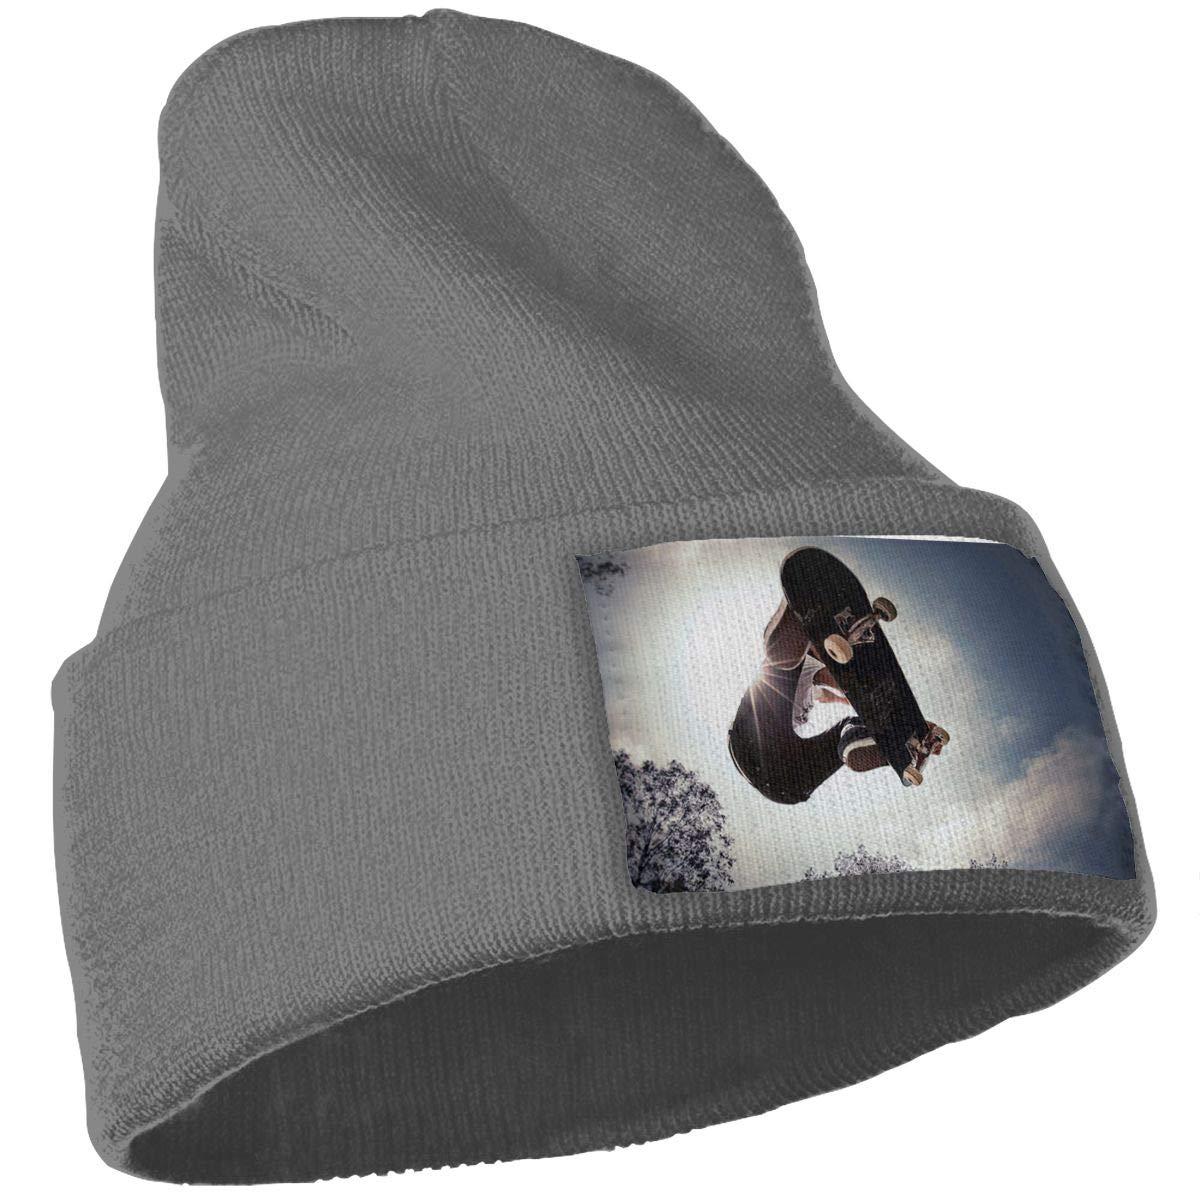 Yubb7E Photo Warm Knit Winter Solid Beanie Hat Unisex Skull Cap